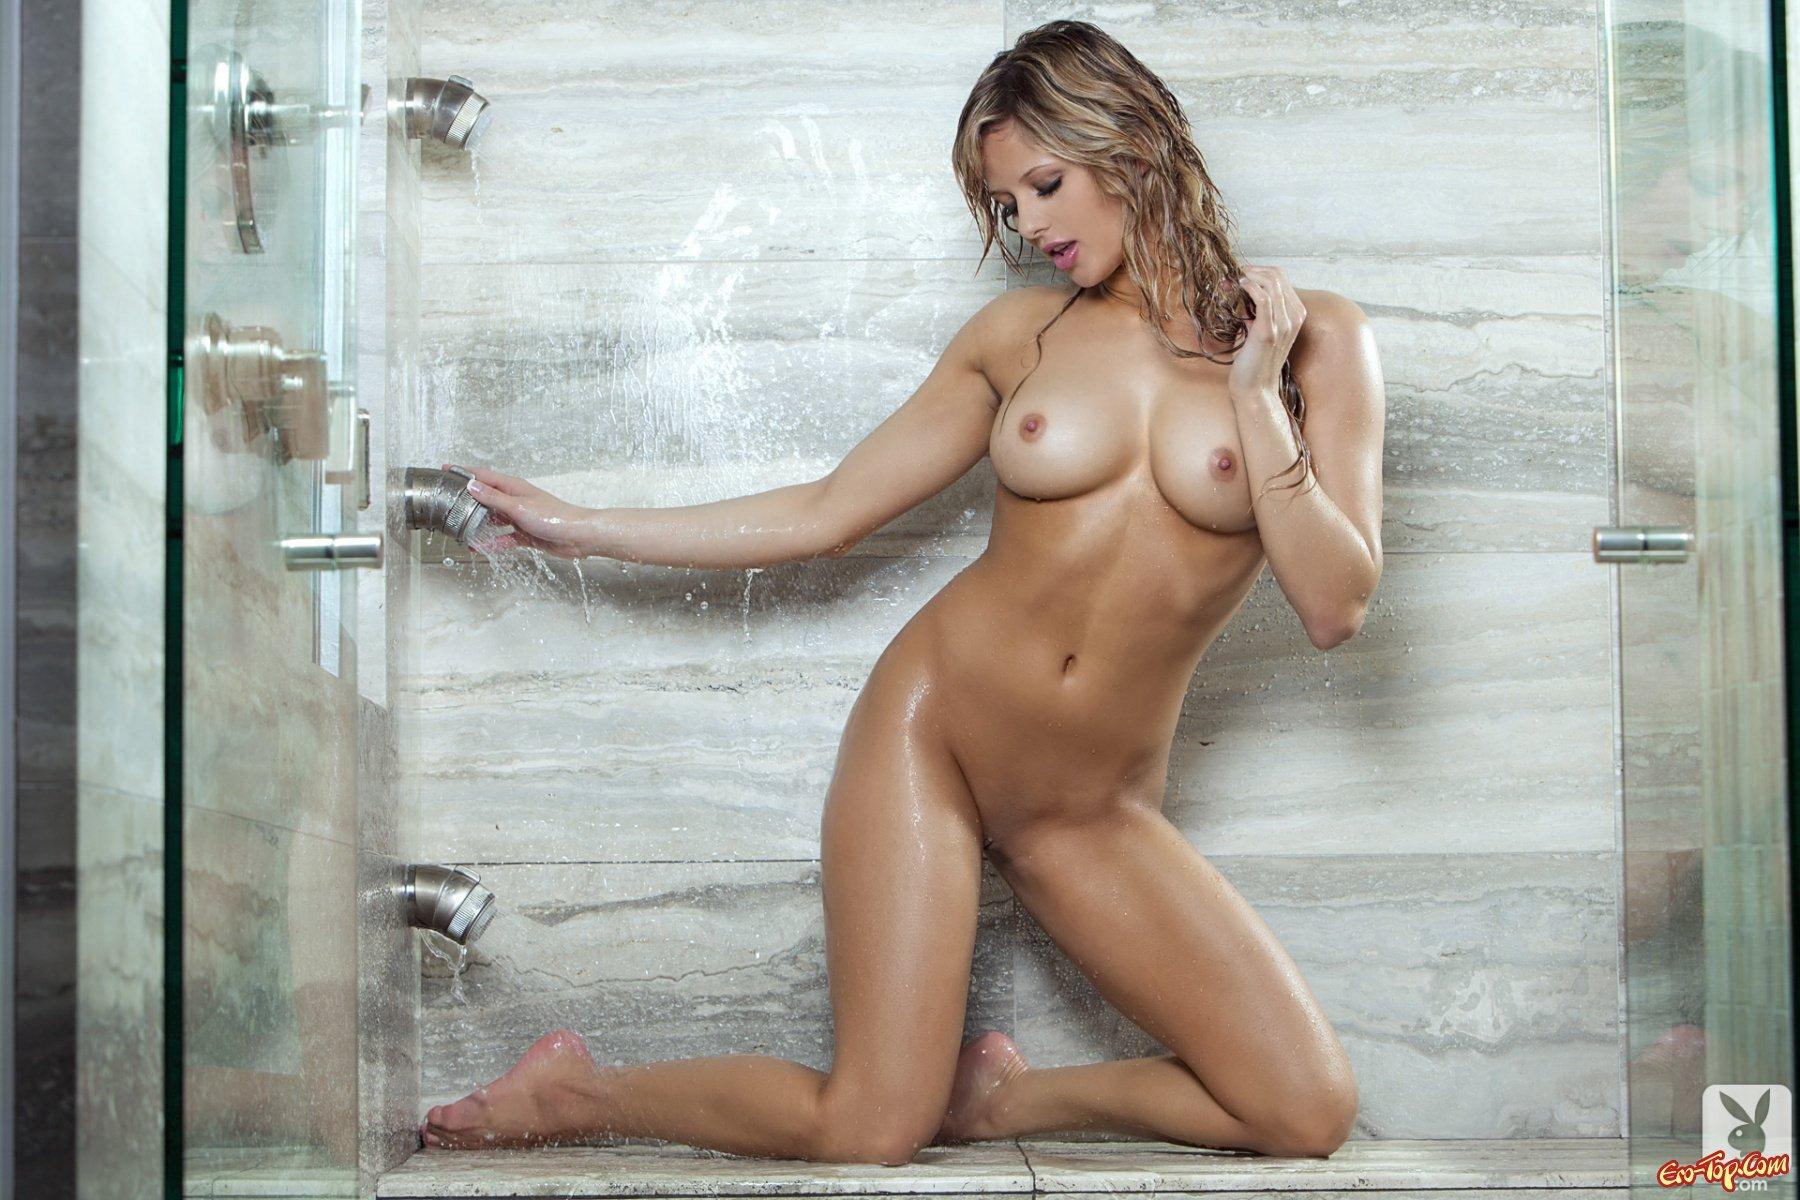 Мокрая красавица с милой фигурой